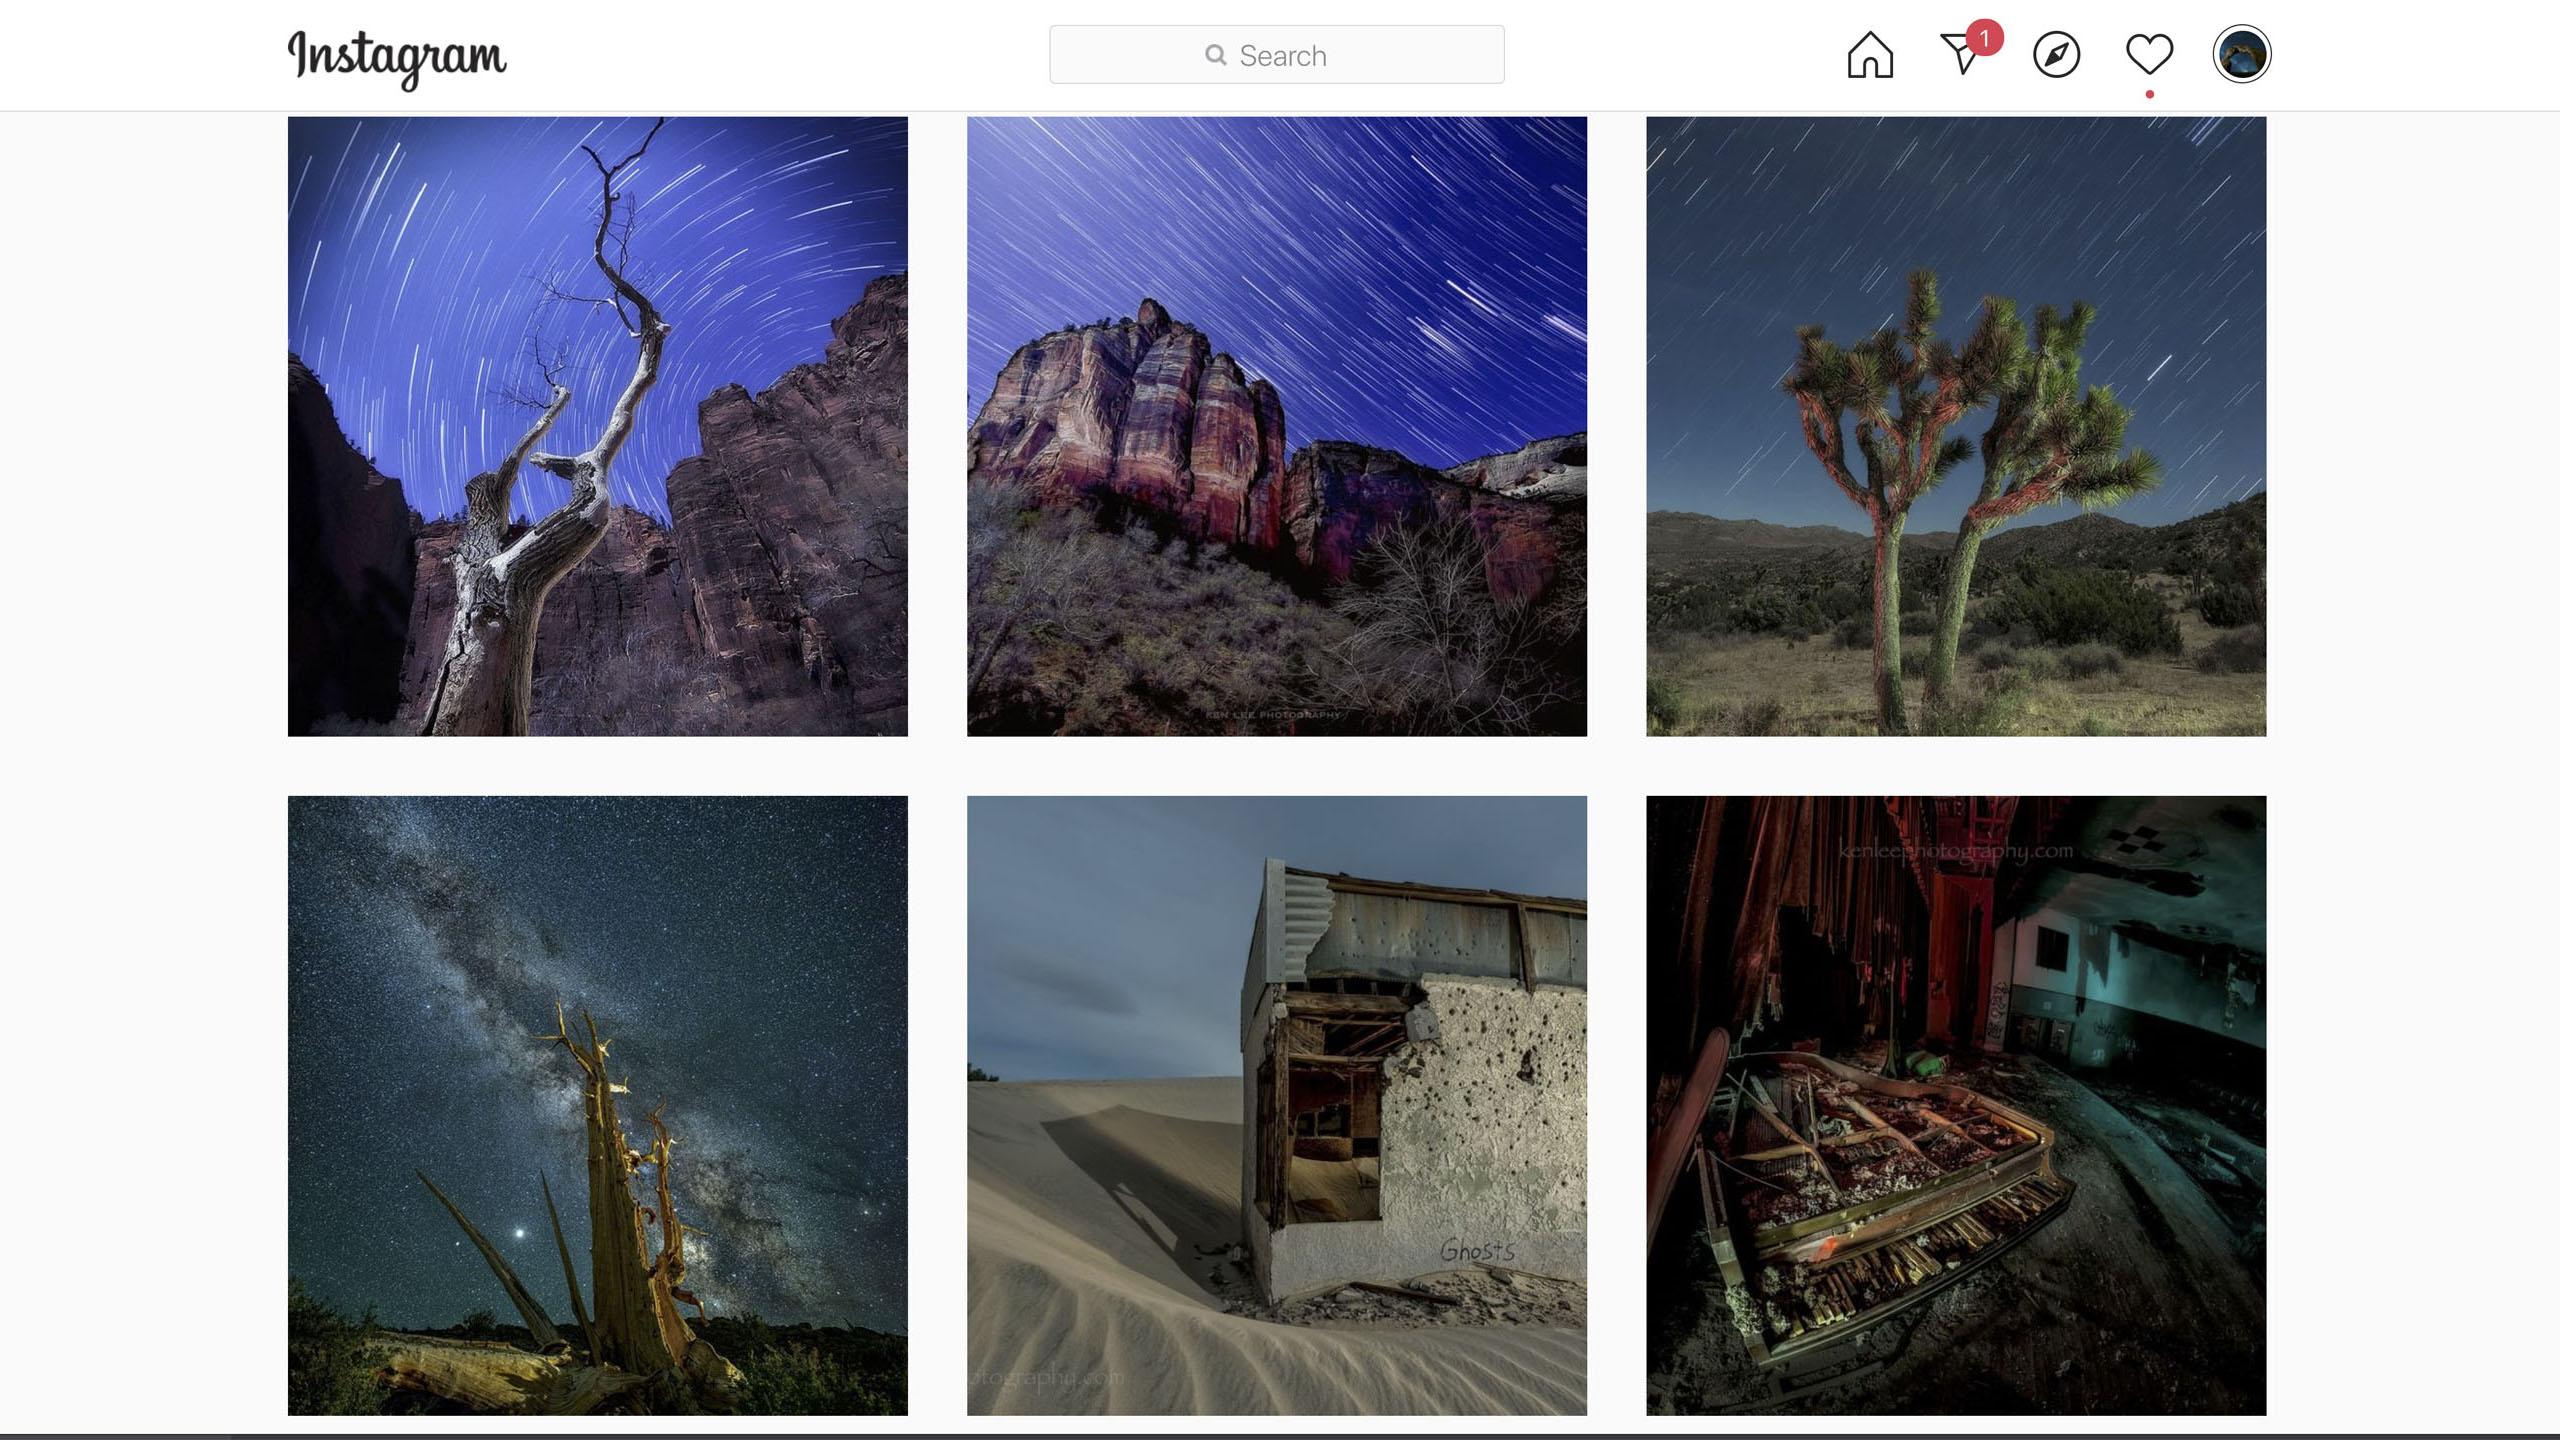 Header-Instagram-screenshot-Photofocus-not-a-photo-sharing-app-any-more-copy